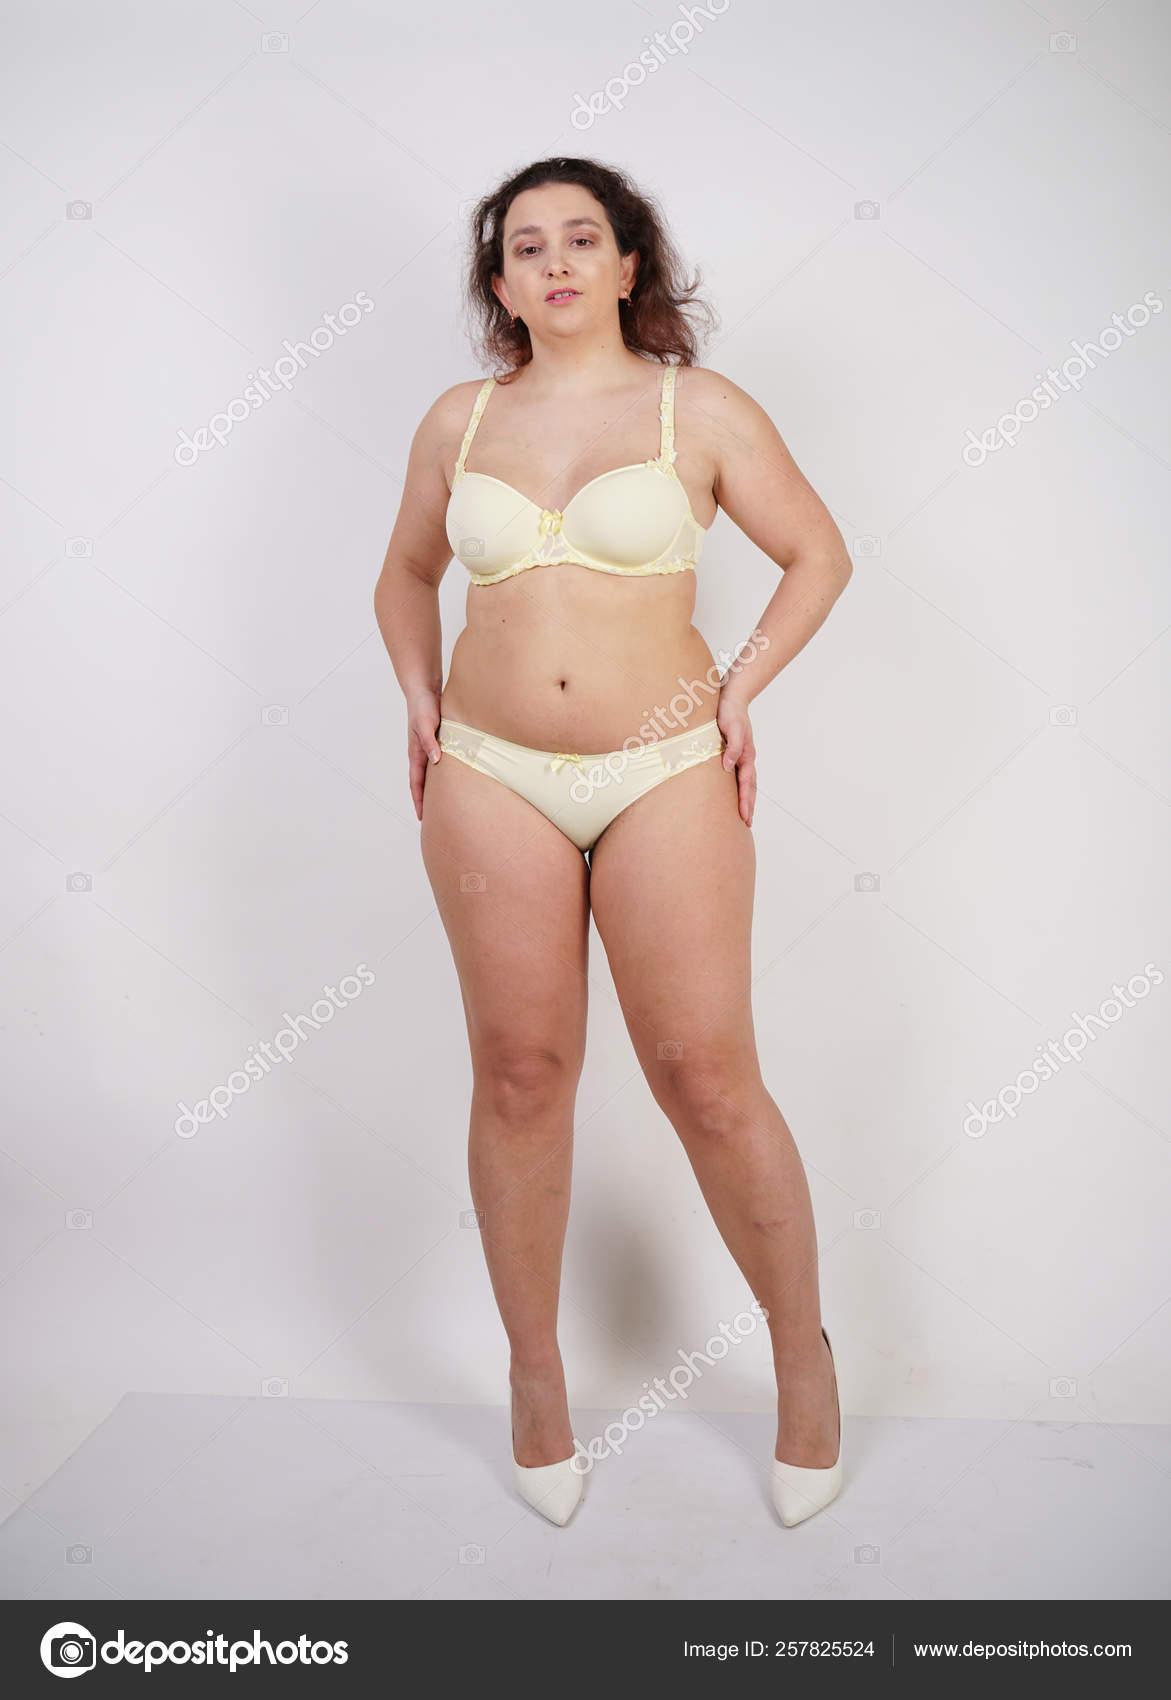 Female Chubby Panties